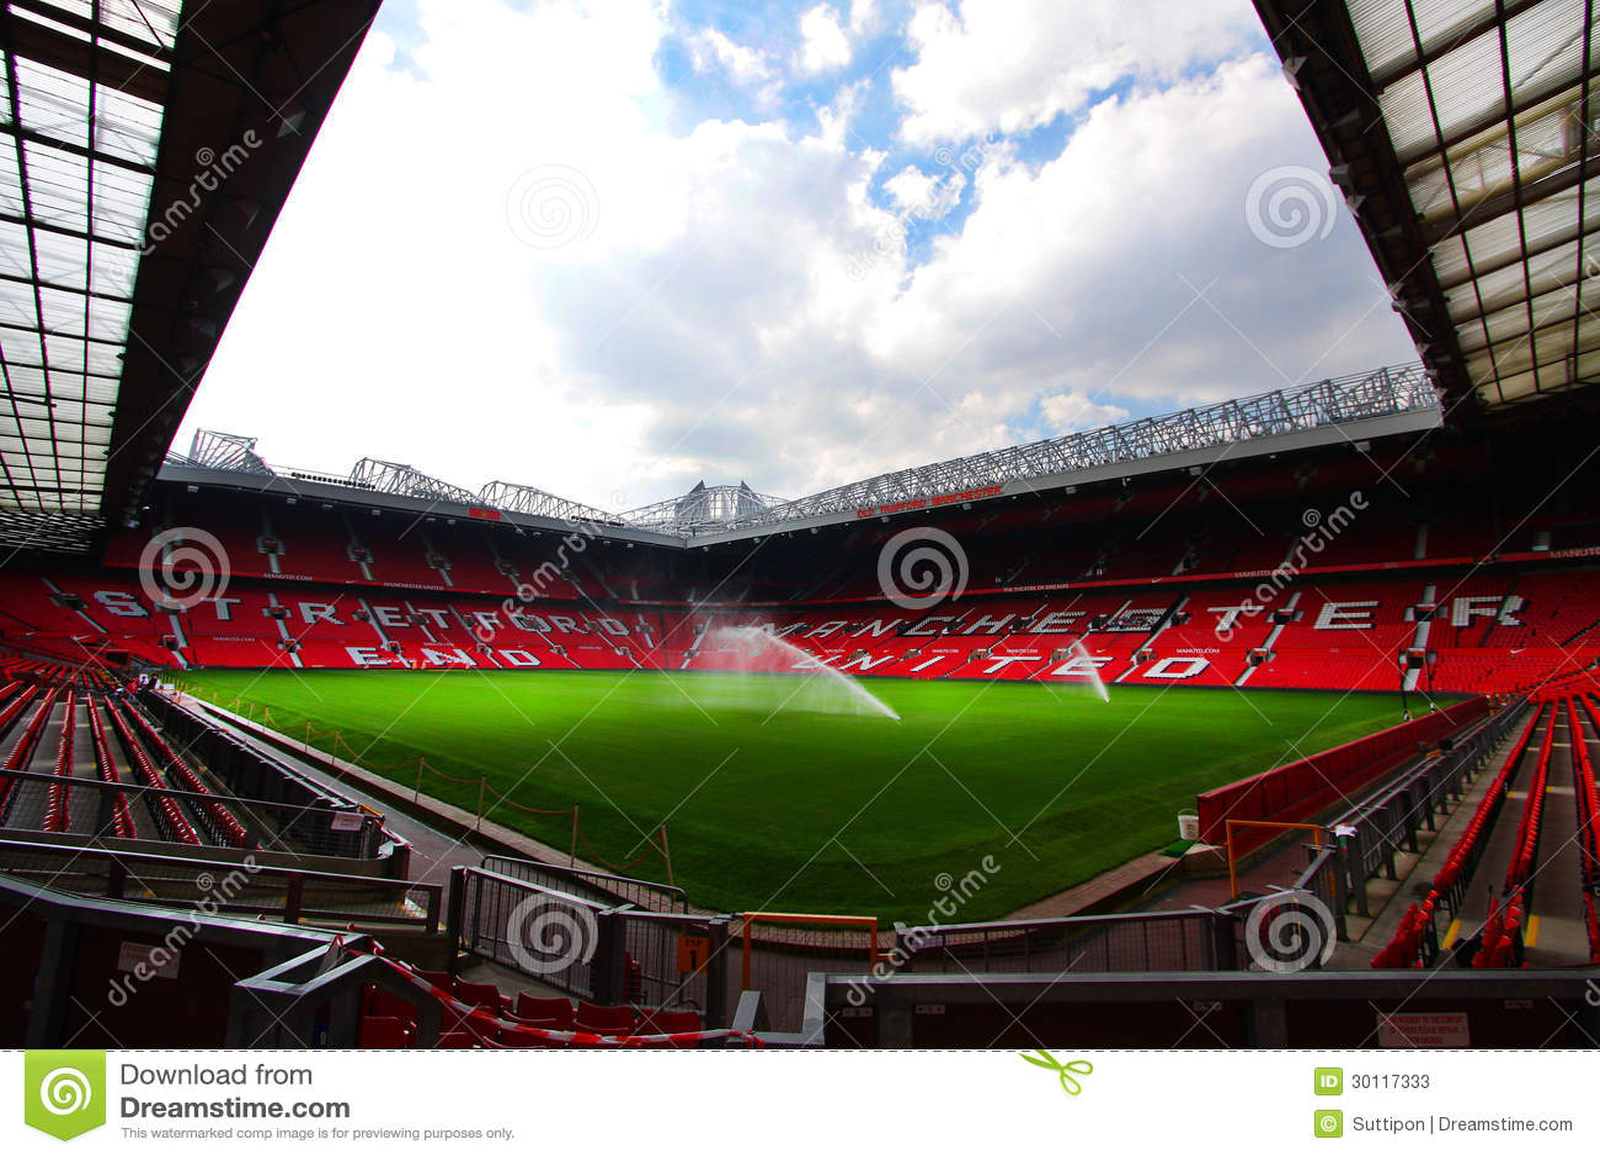 Old Trafford Stadium Editorial Stock Photo - Image: 30117333